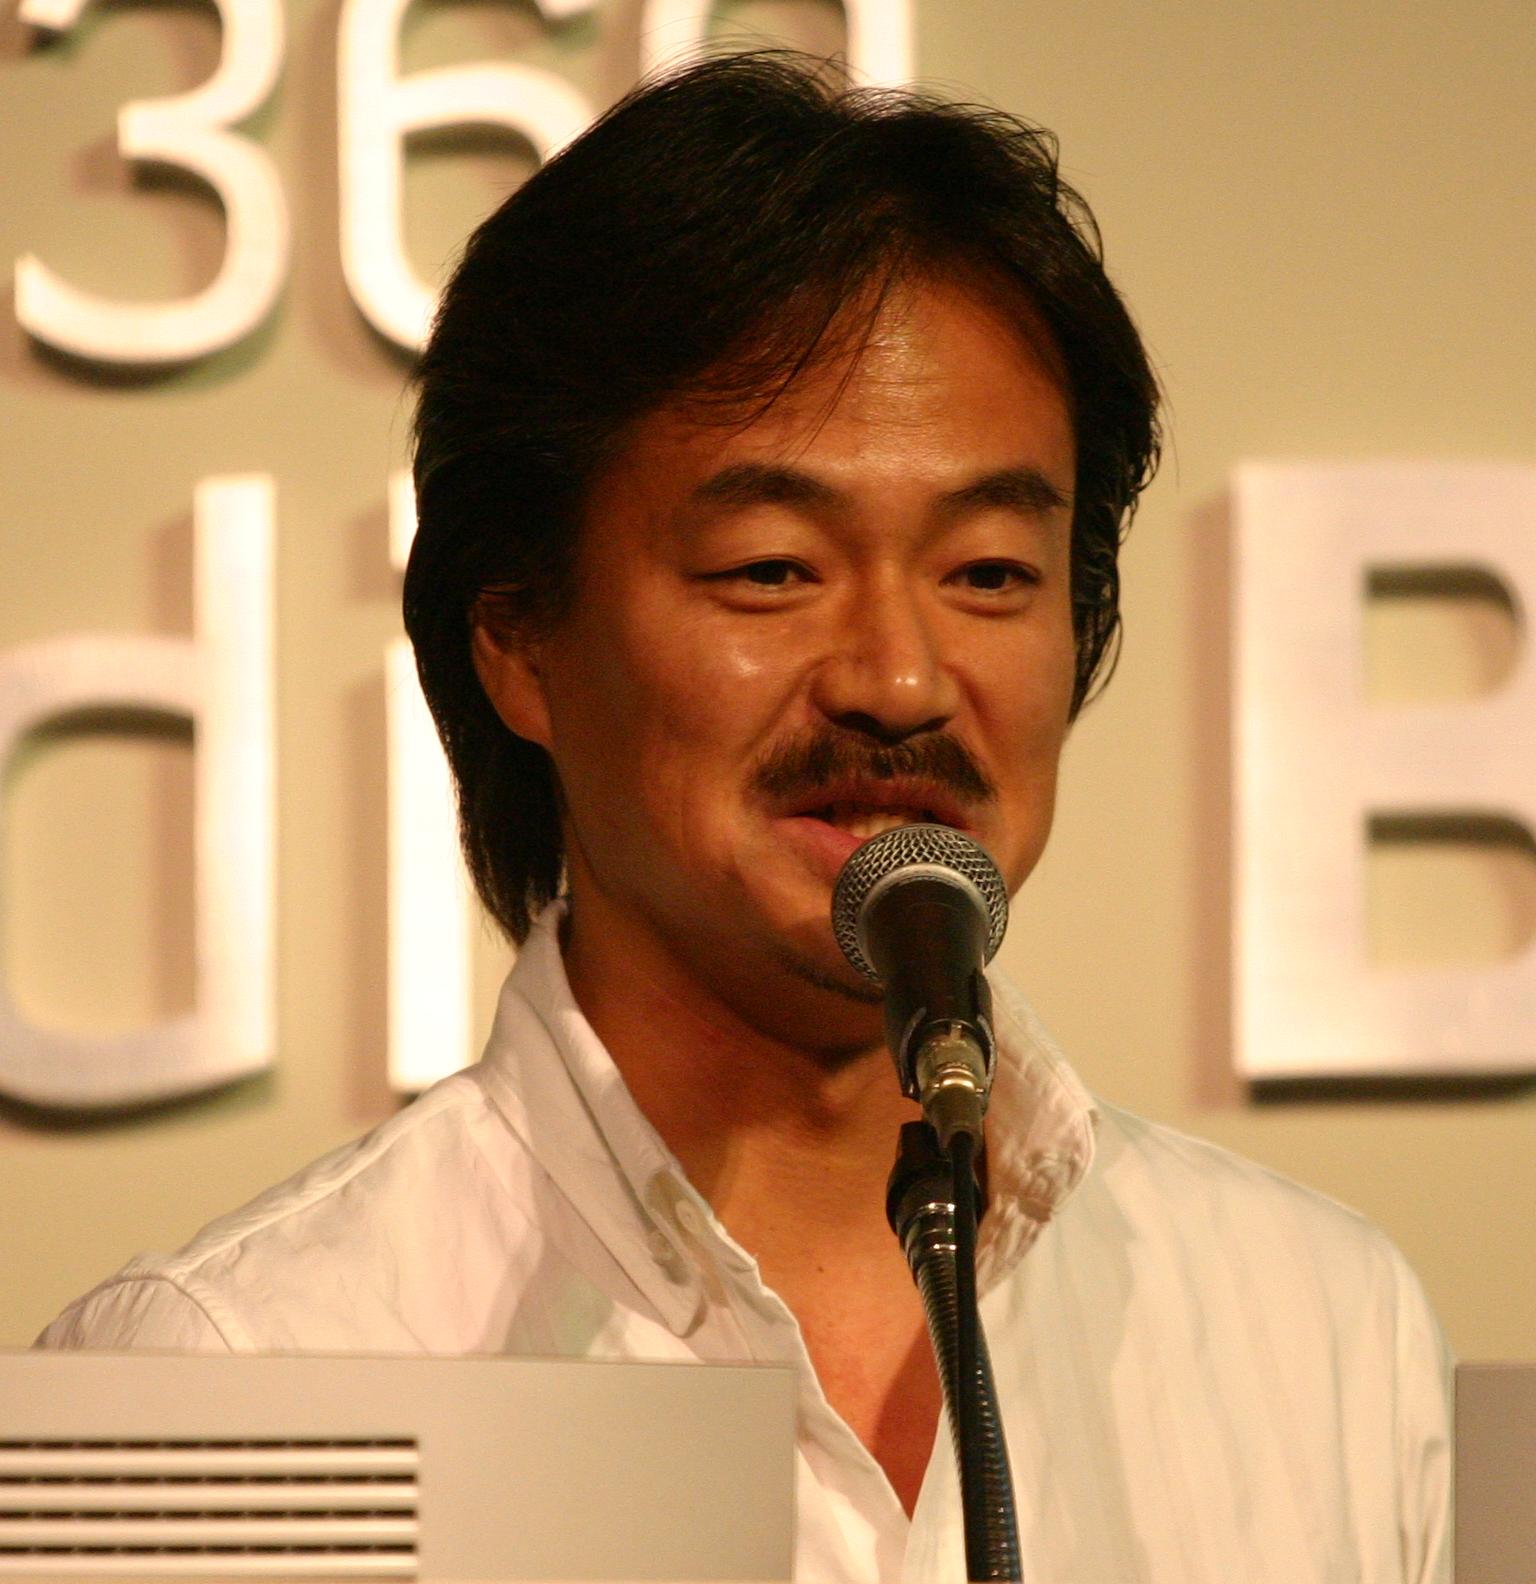 tokyo game show 2006 jpg